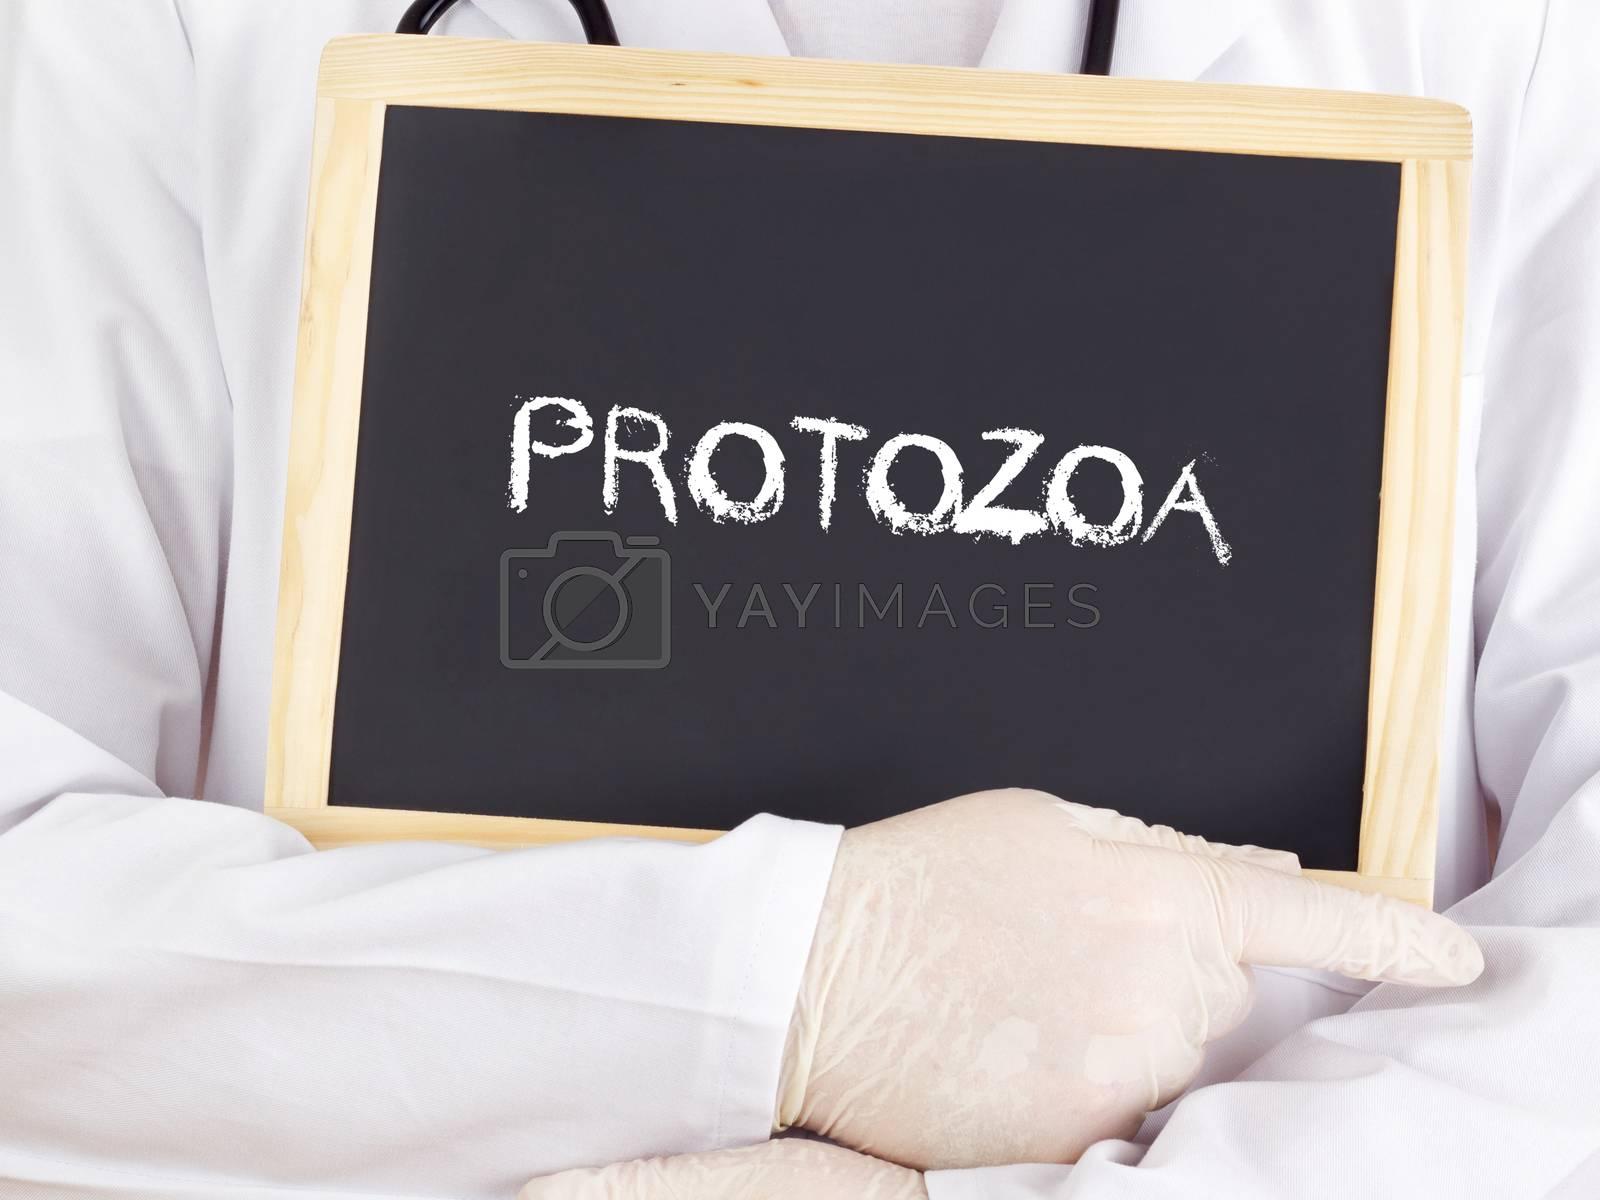 Doctor shows information: protozoa